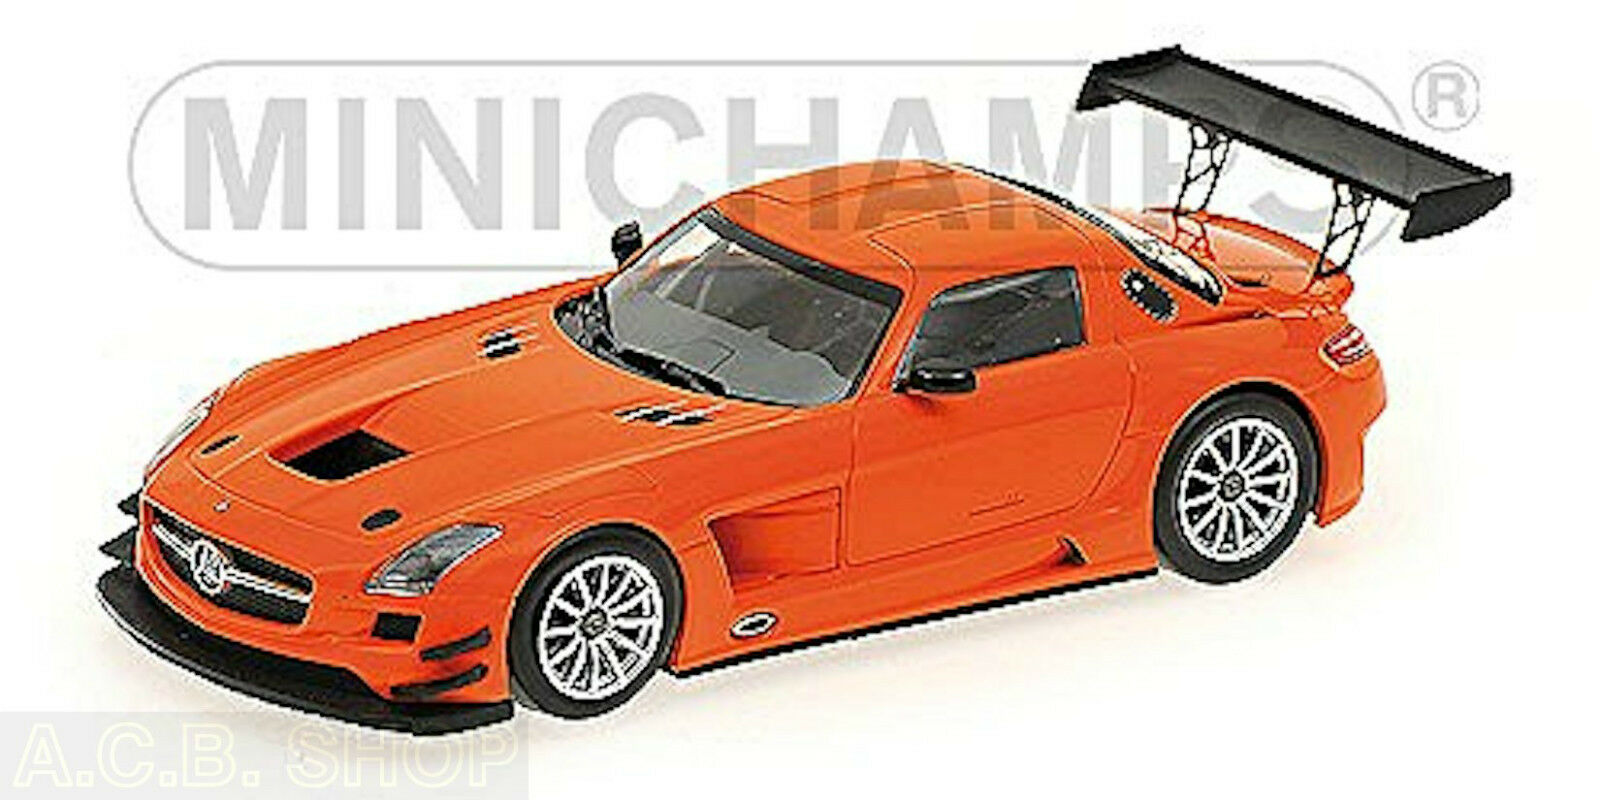 Mercedes Benz Sls amg gt3 Street Orange 1 43 Minichamps Ed. 528 PC.